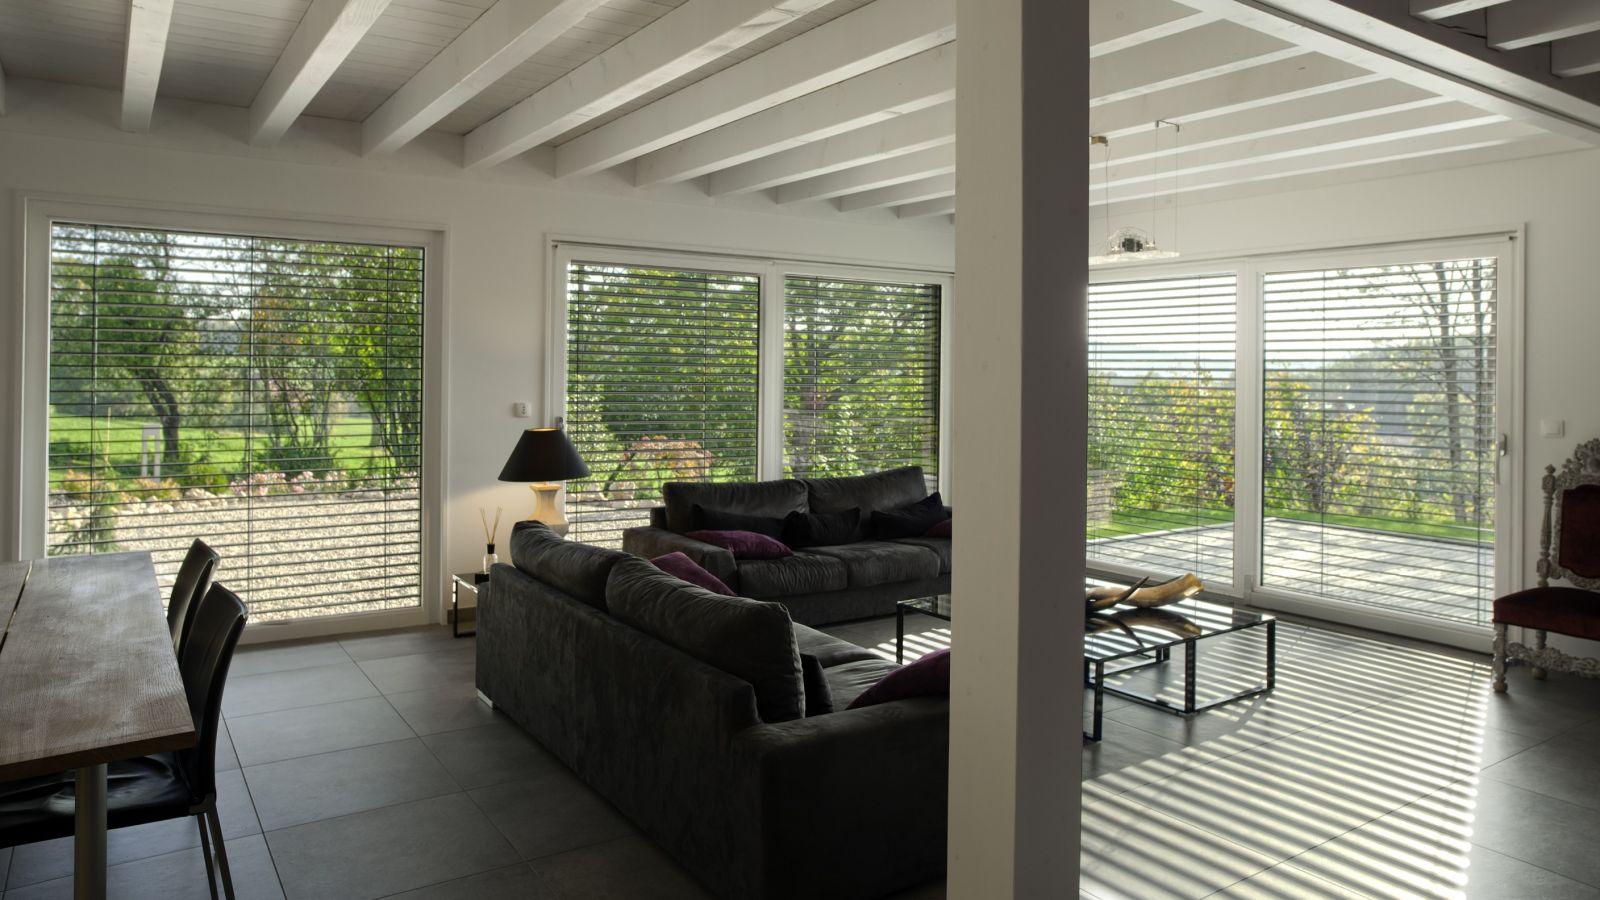 brise soleil orientables stores bso sur mesure komilfo. Black Bedroom Furniture Sets. Home Design Ideas